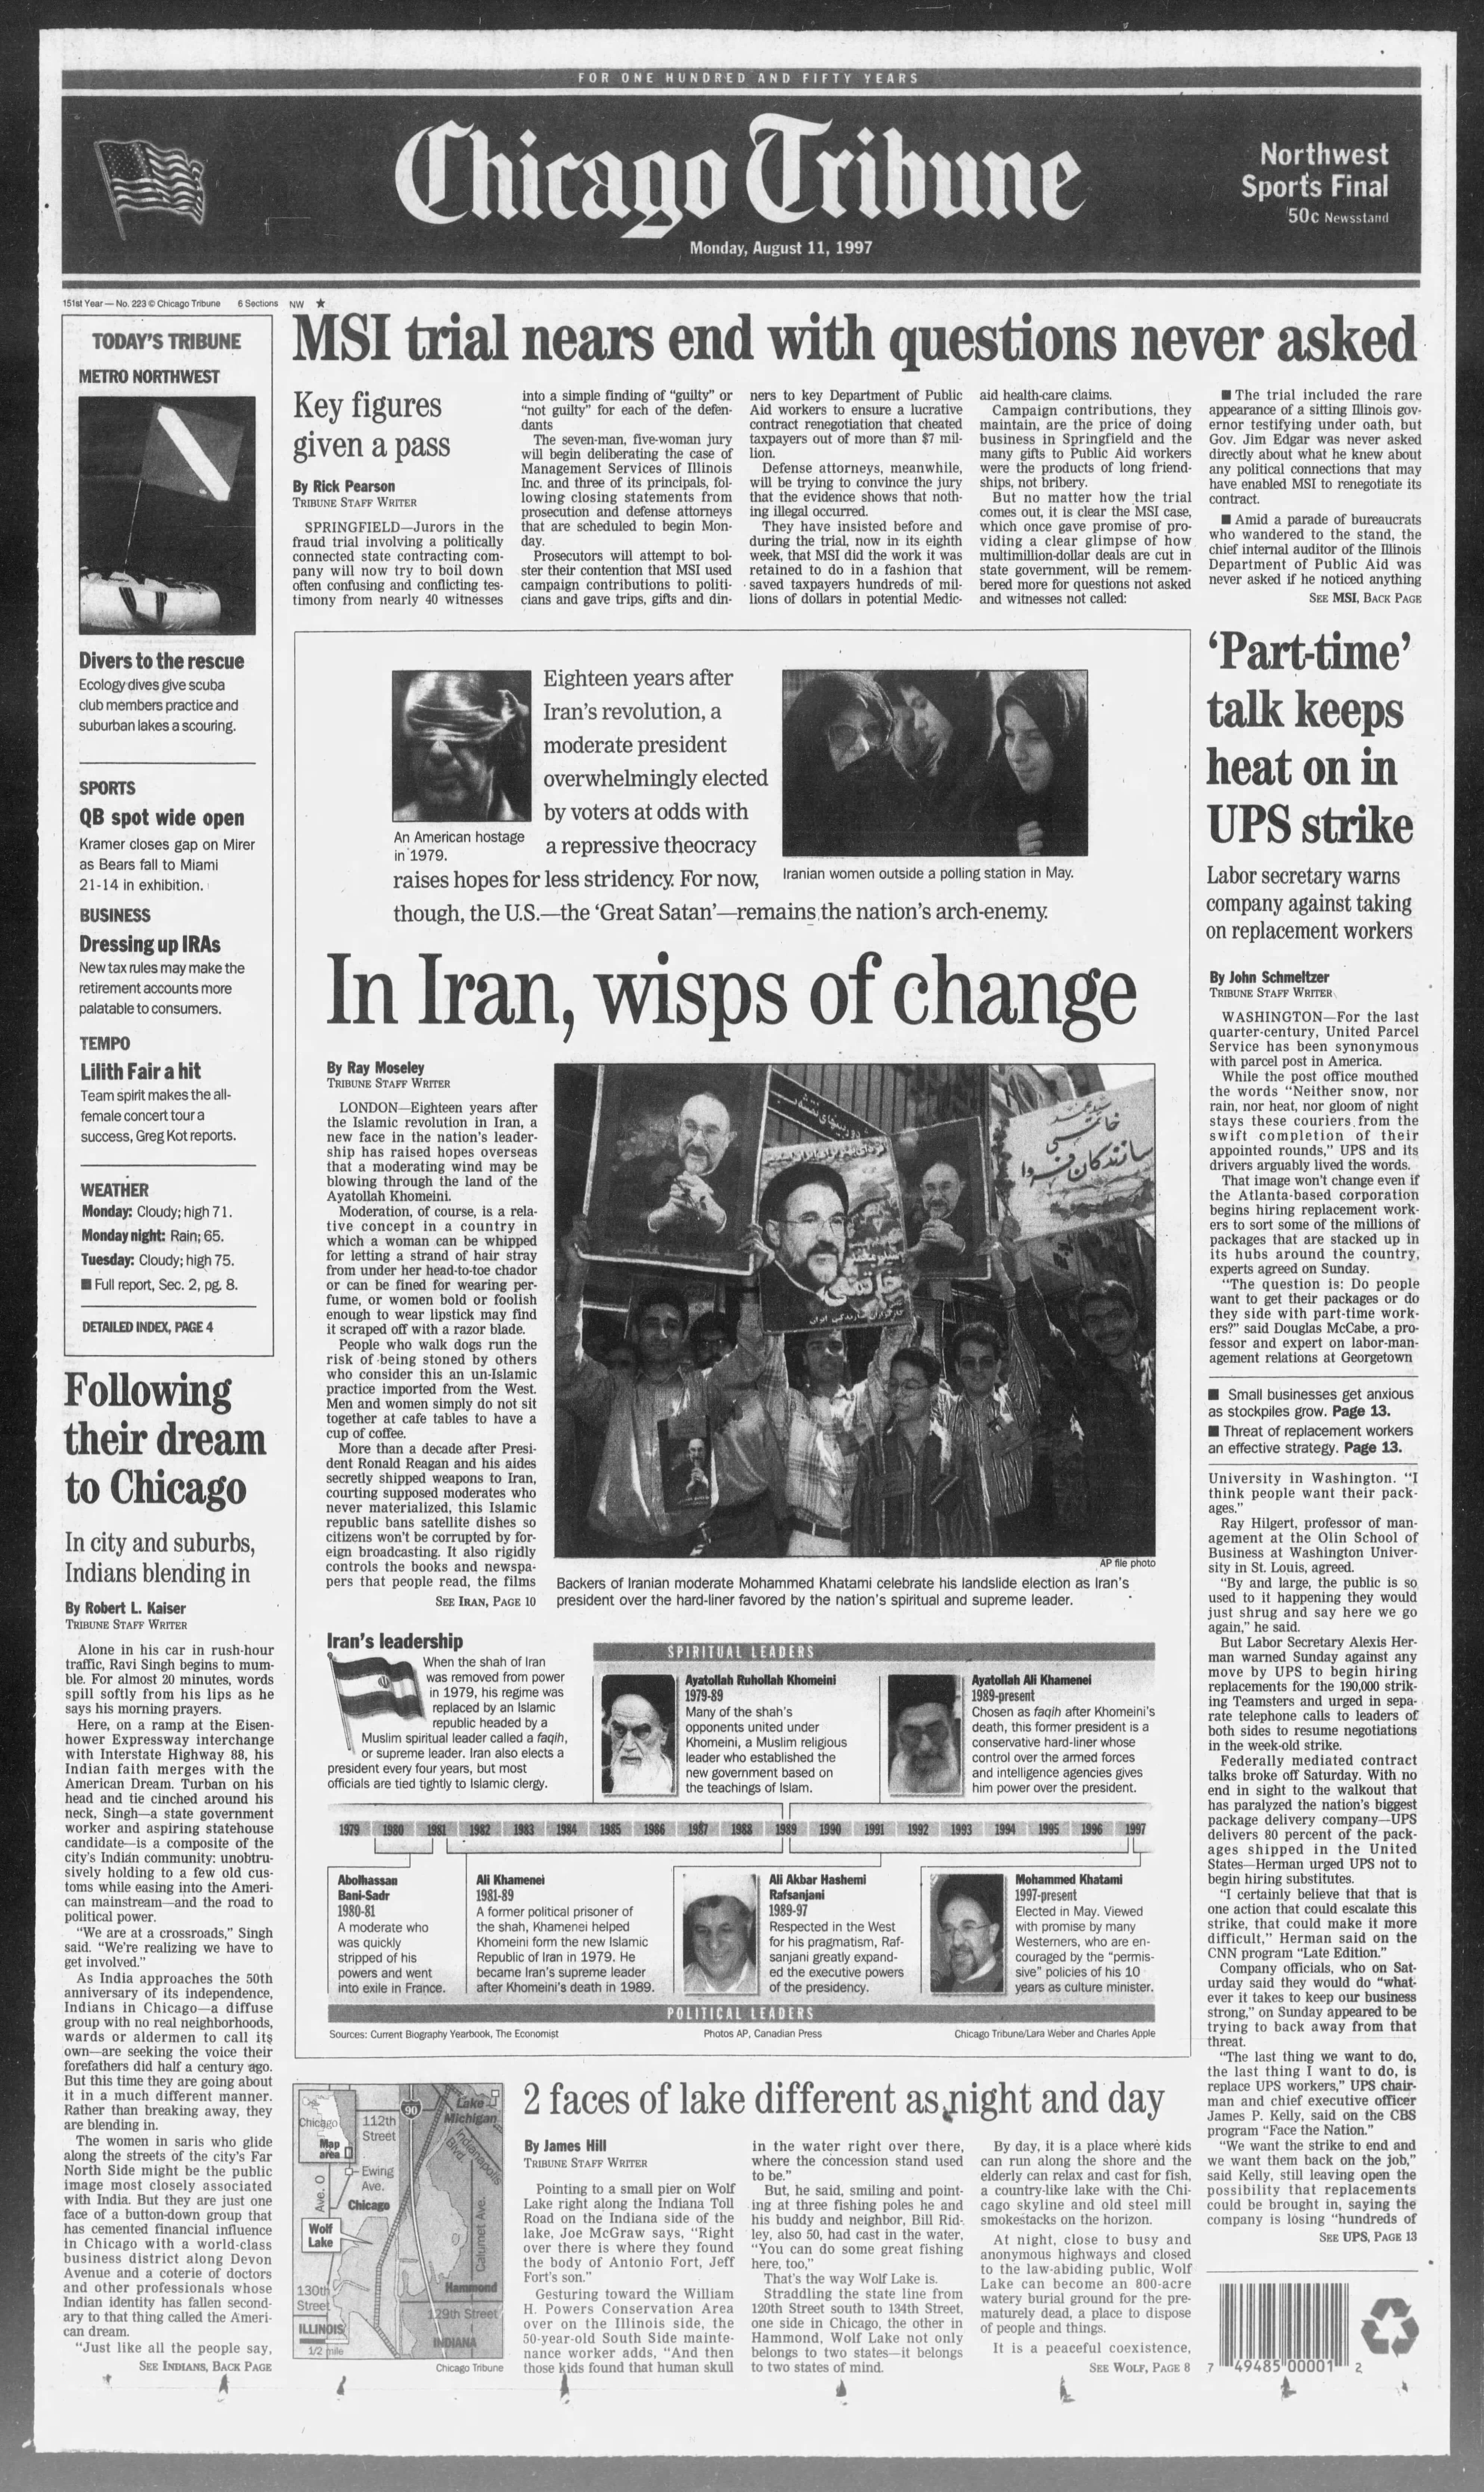 Ravi Singh makes front page of Chicago Tribune